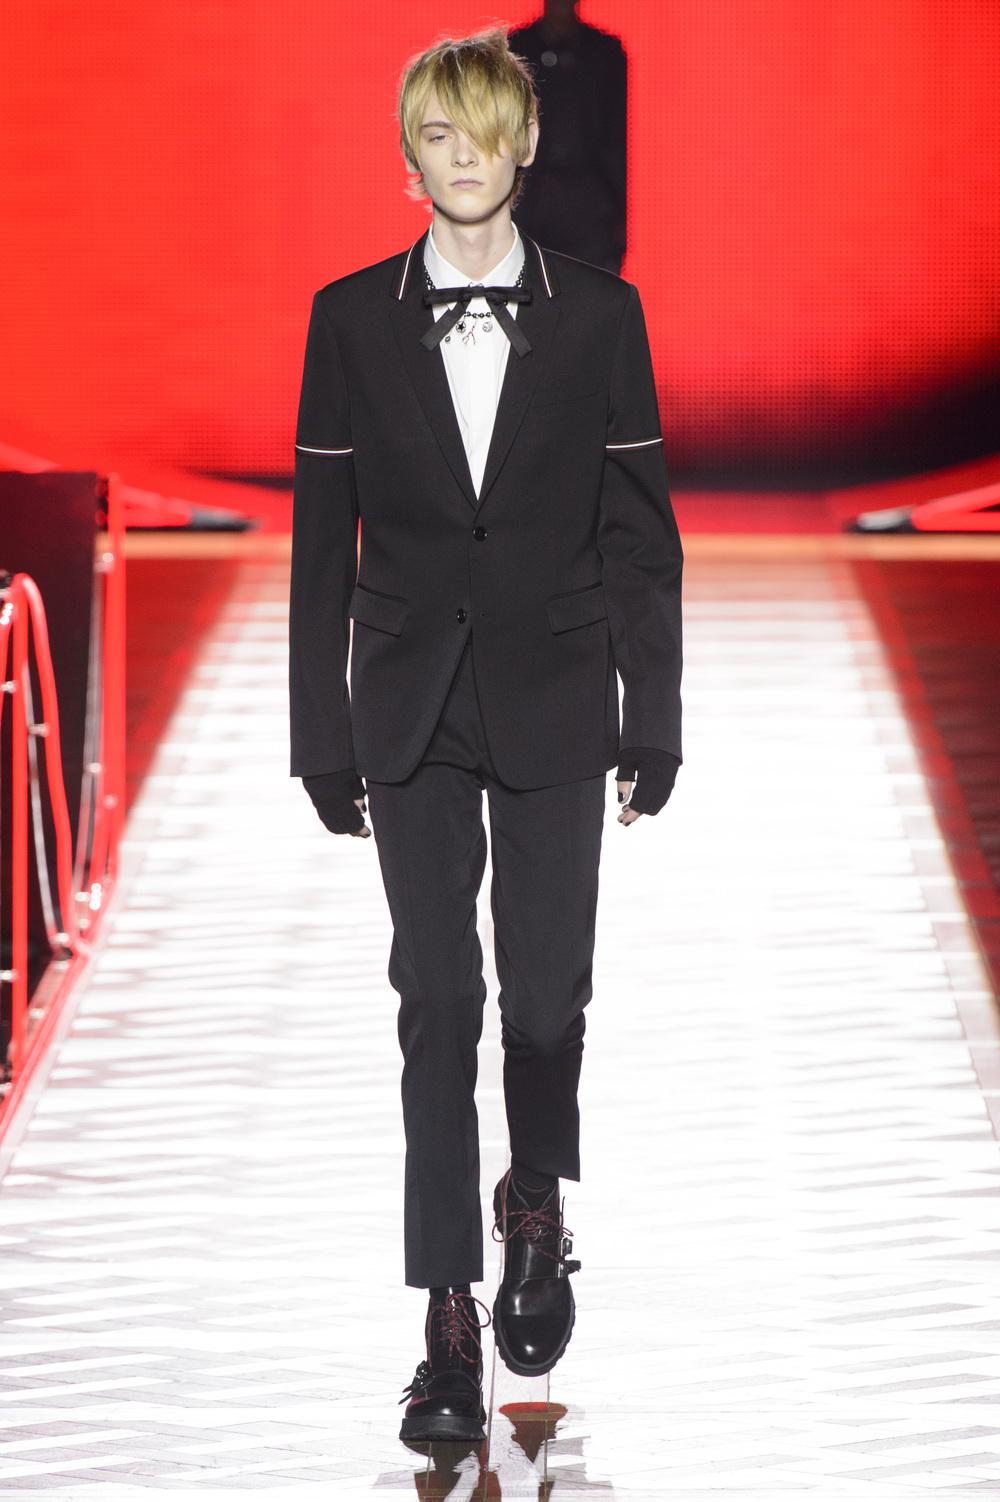 Dior_Homme_Hiver2016-17_look_02.JPG